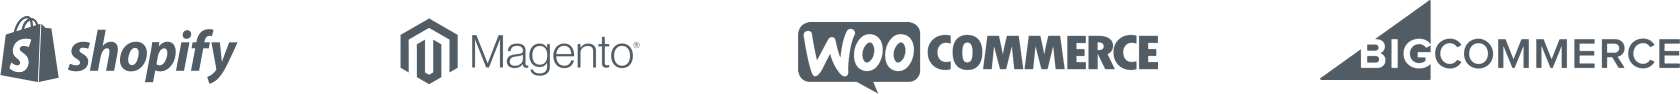 ecommerce platform integrations